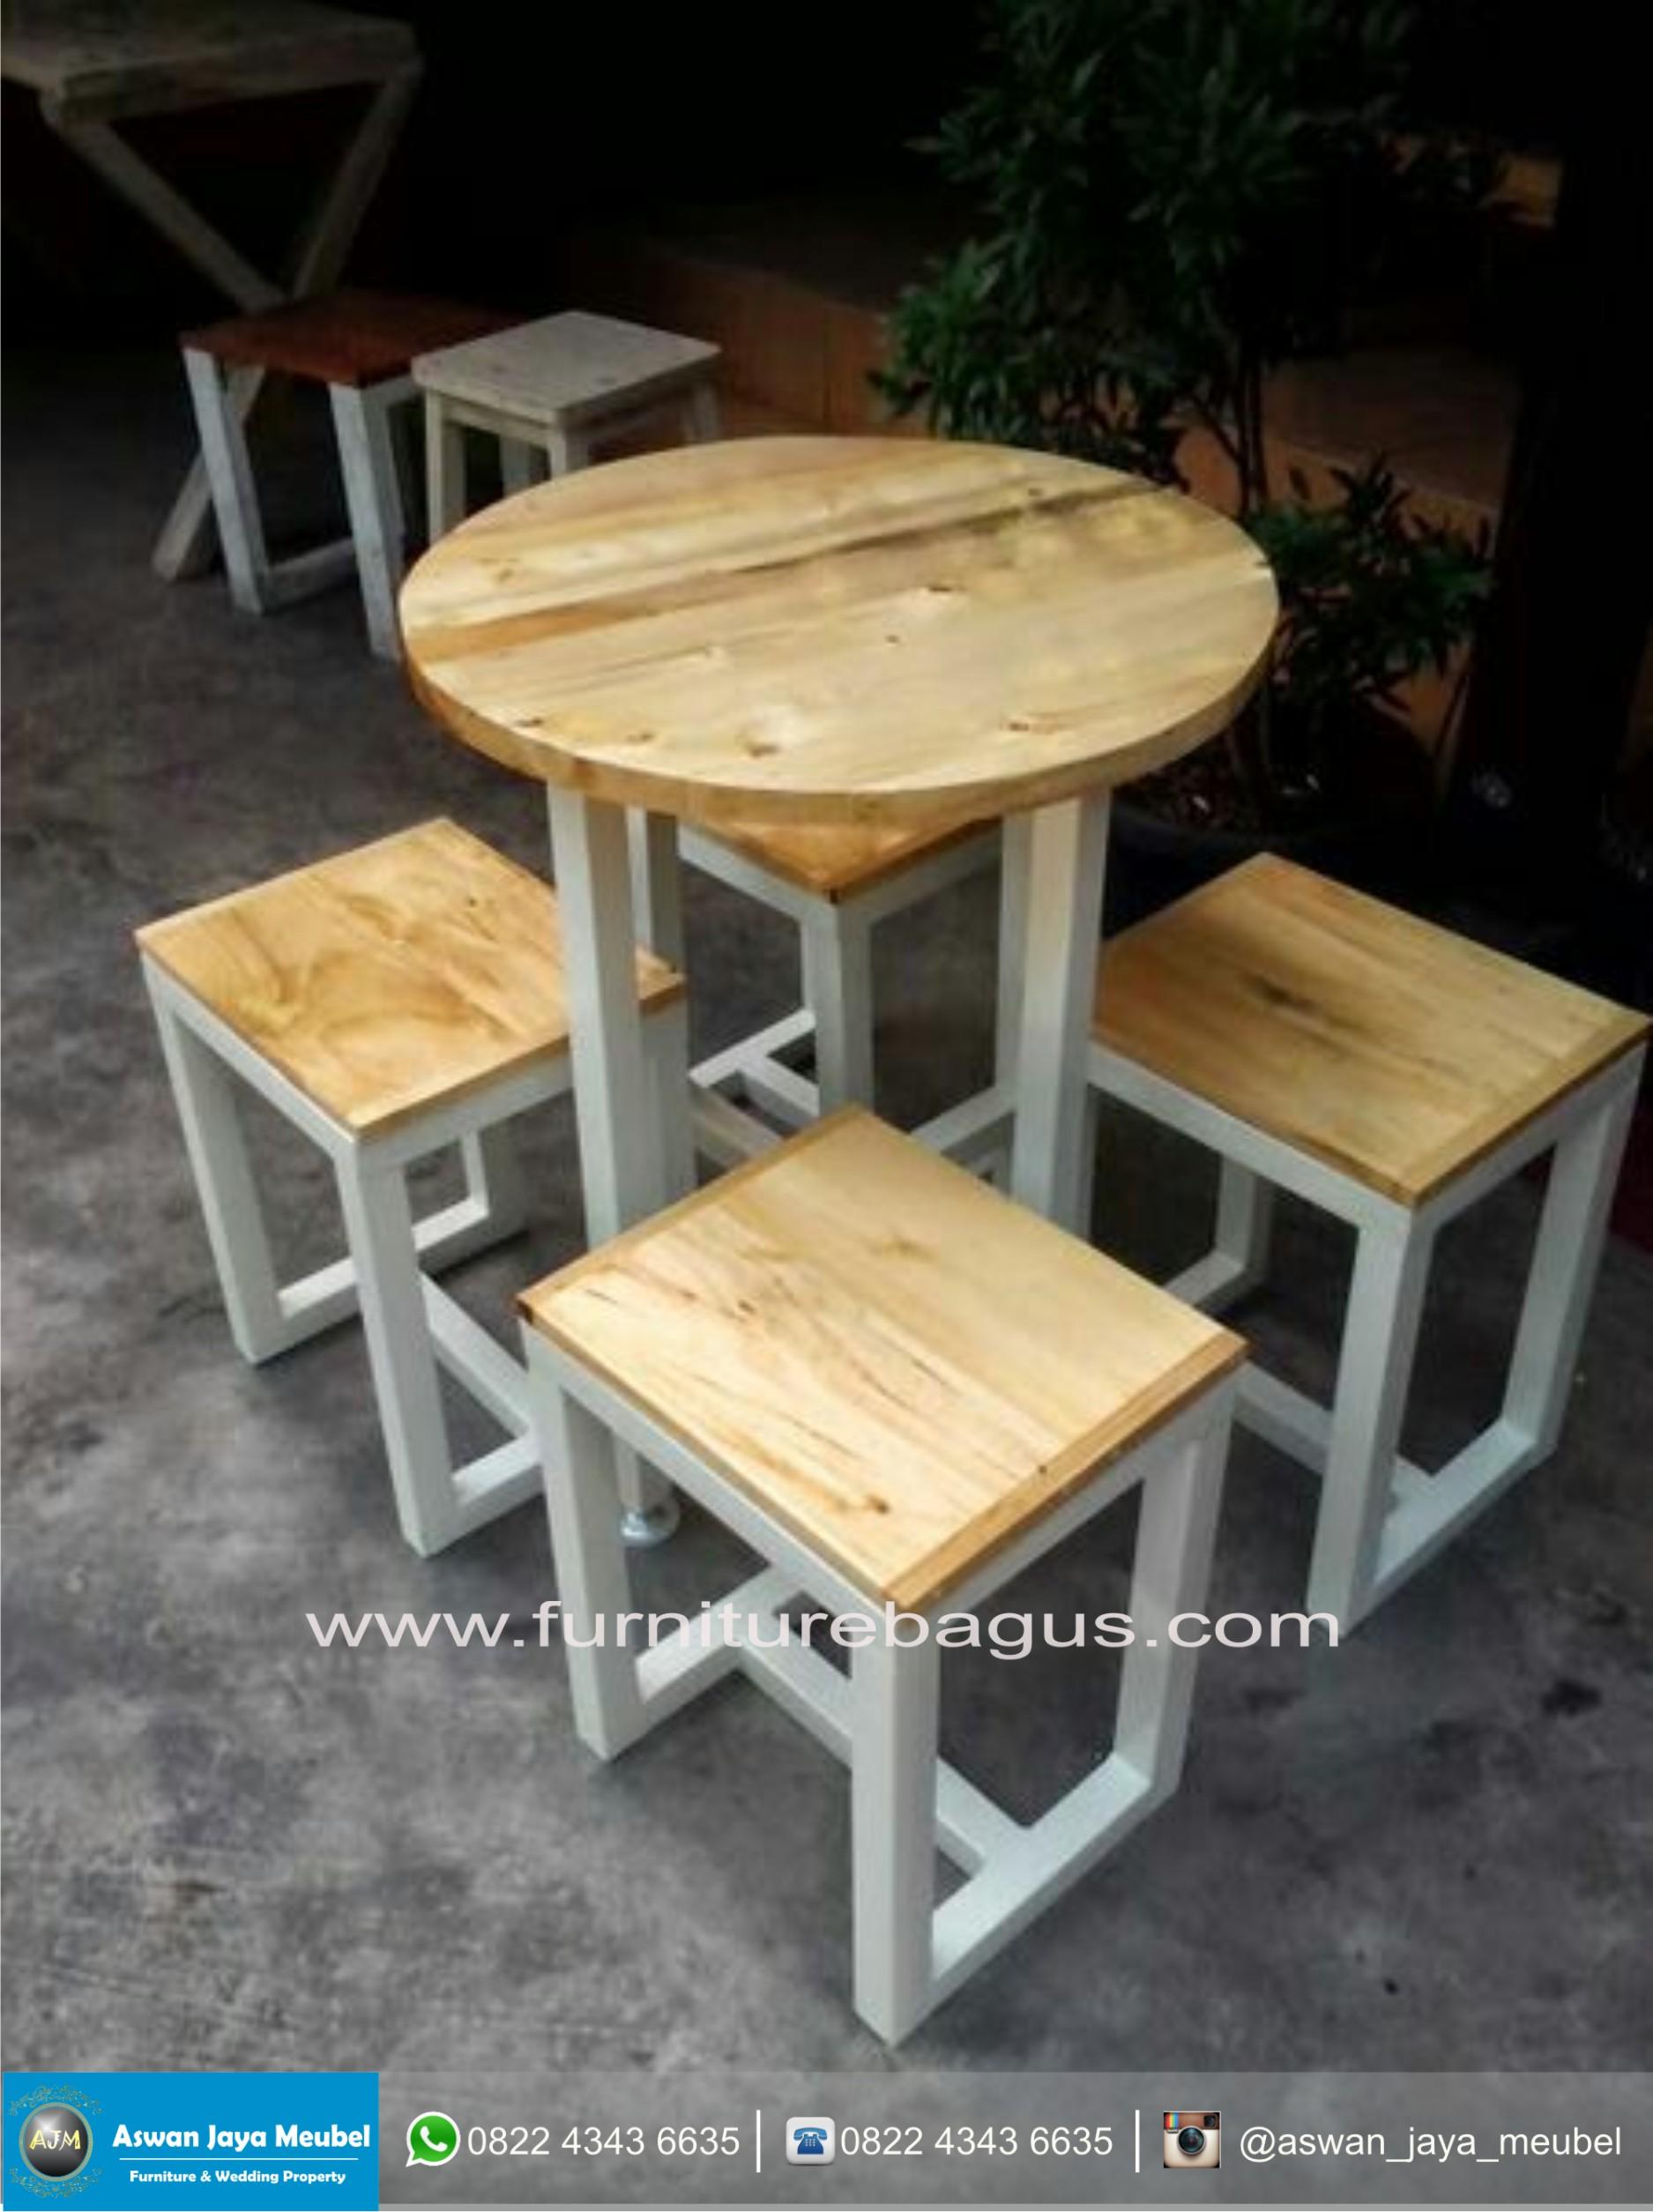 Kursi Cafe Minimalis Terlaris Aswan Jaya Meubel